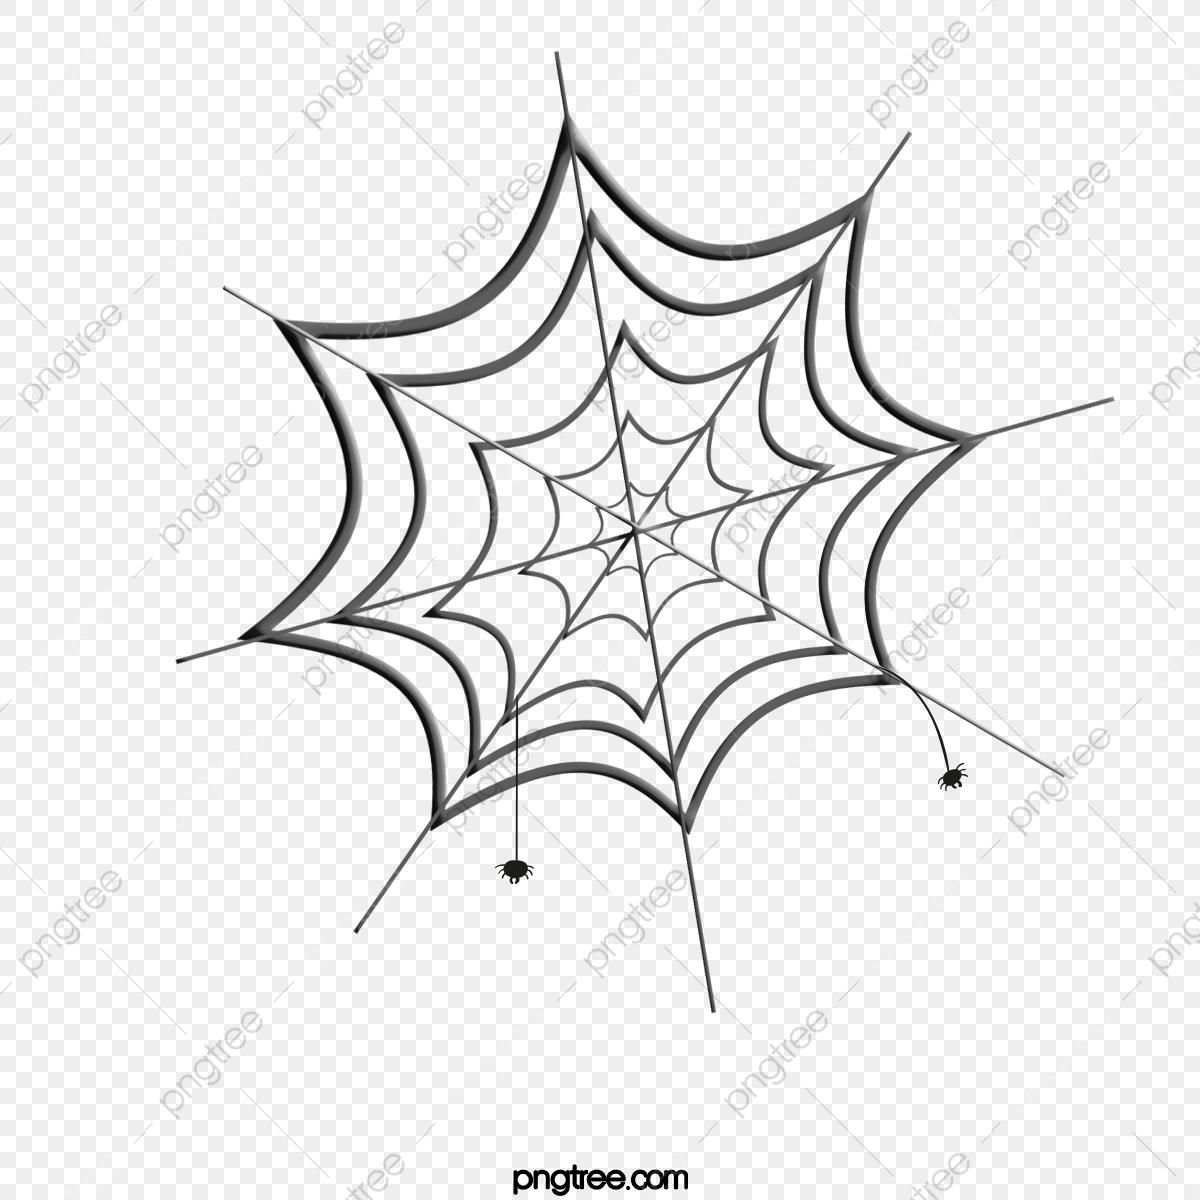 Illustration De Dessin Animé Texture Toile D'araignée Mignon concernant Dessin Toile Araignée